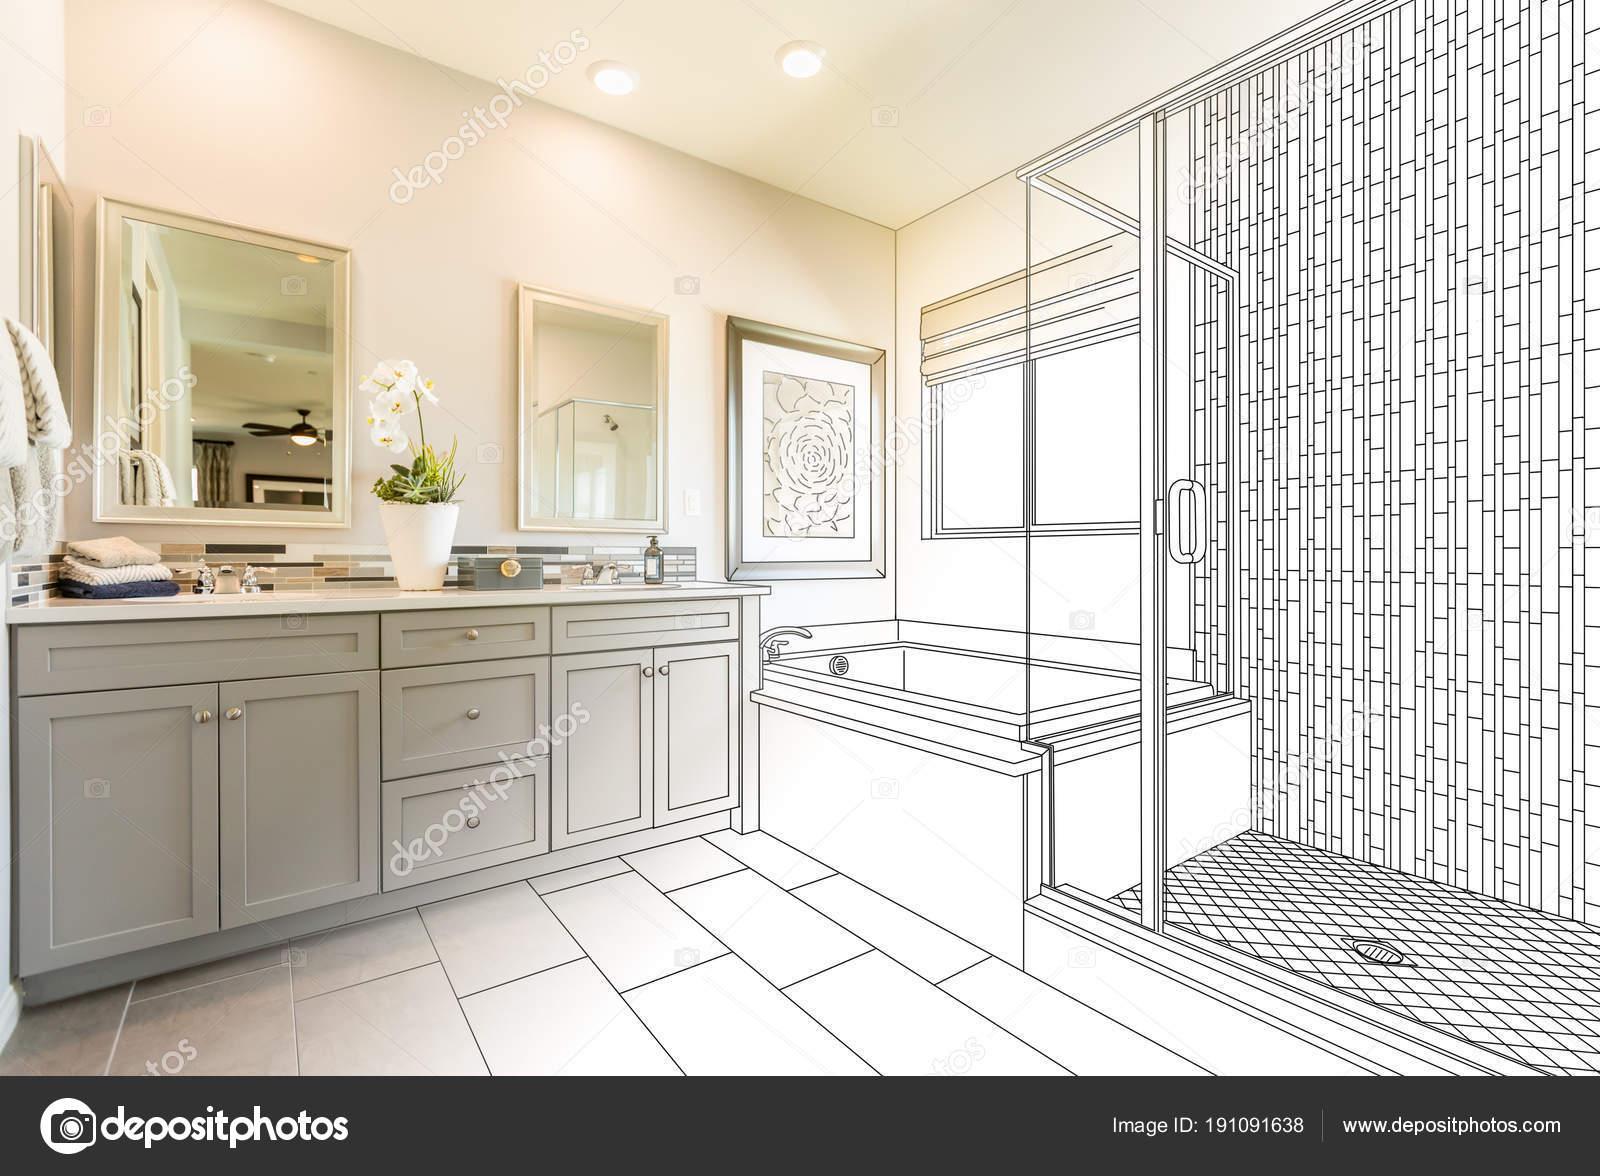 Design Koupelen Vlastni Hlavni Vykres Gradating Na Hotove Fotografie